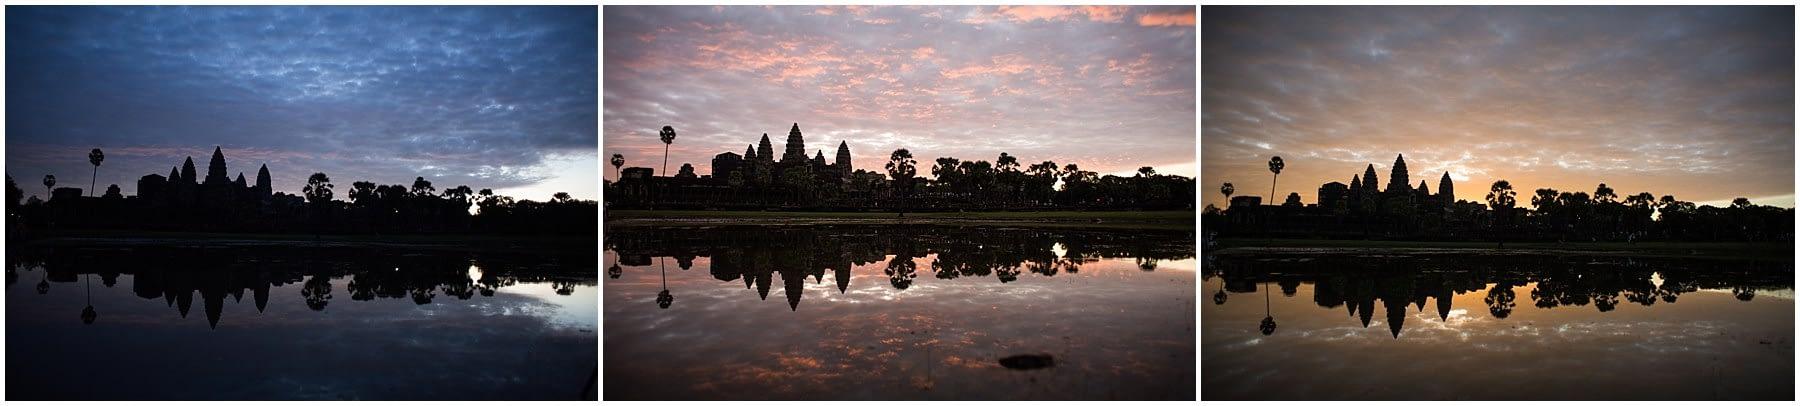 Cambodia_0028.jpg